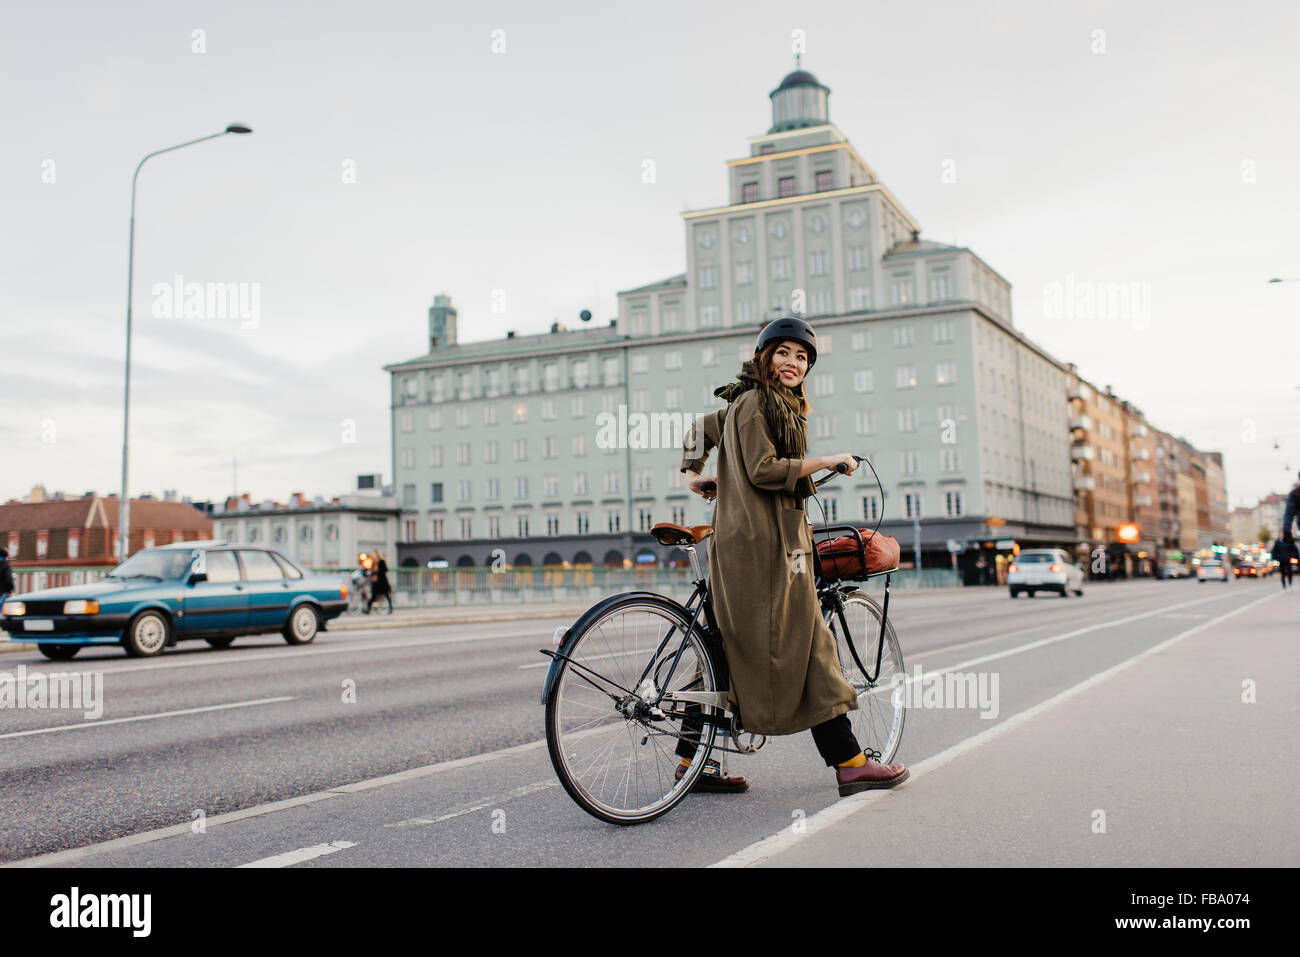 Sweden, Uppland, Stockholm, Vasatan, Sankt Eriksgatan, Woman cycling on city street - Stock Image